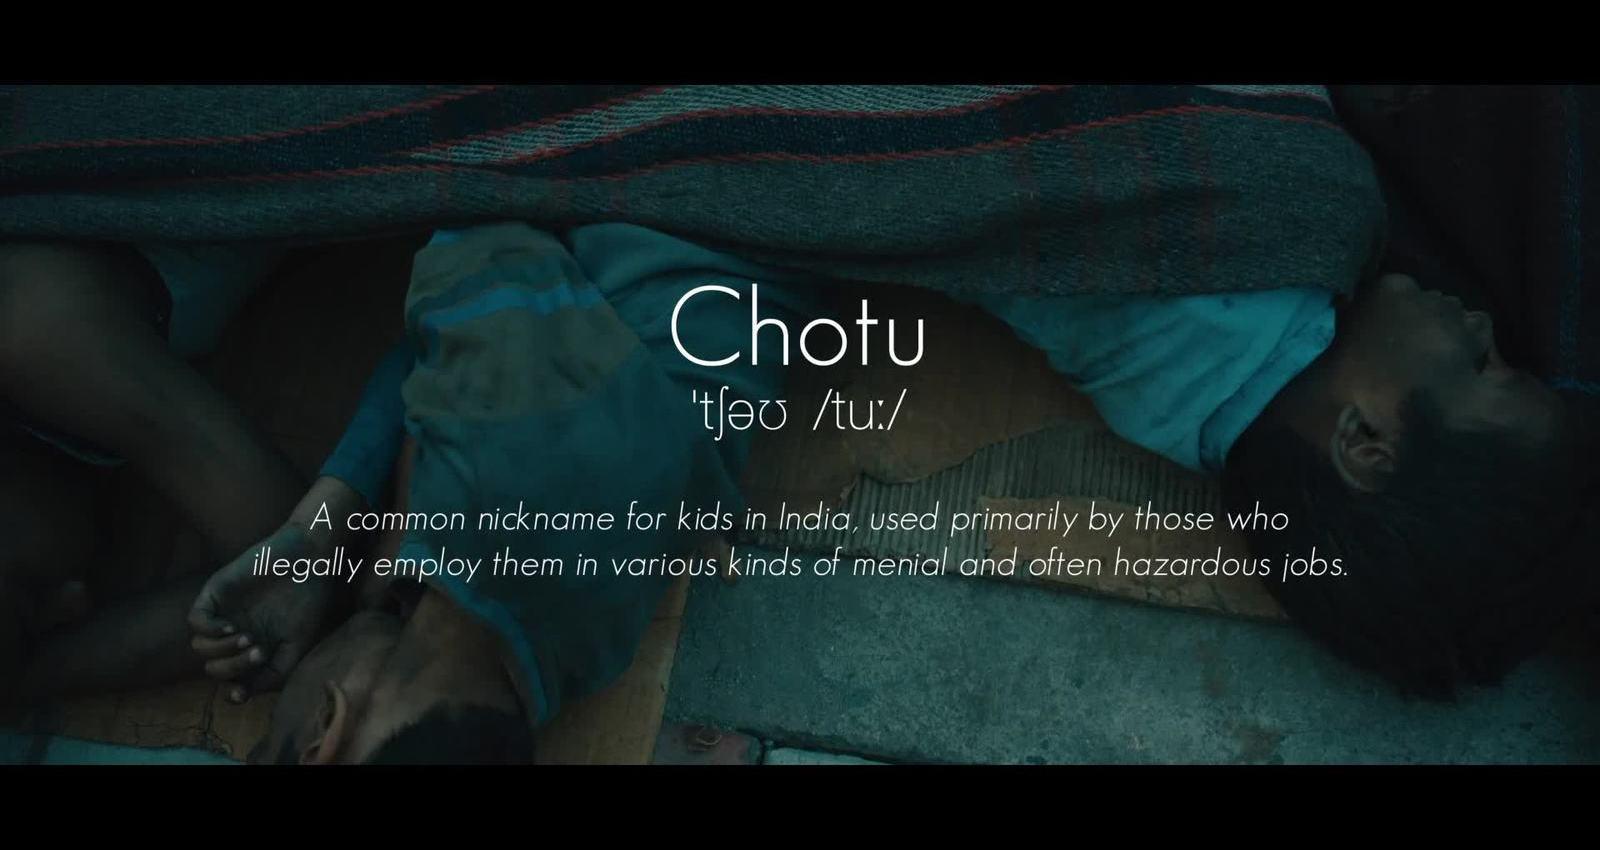 Chotu